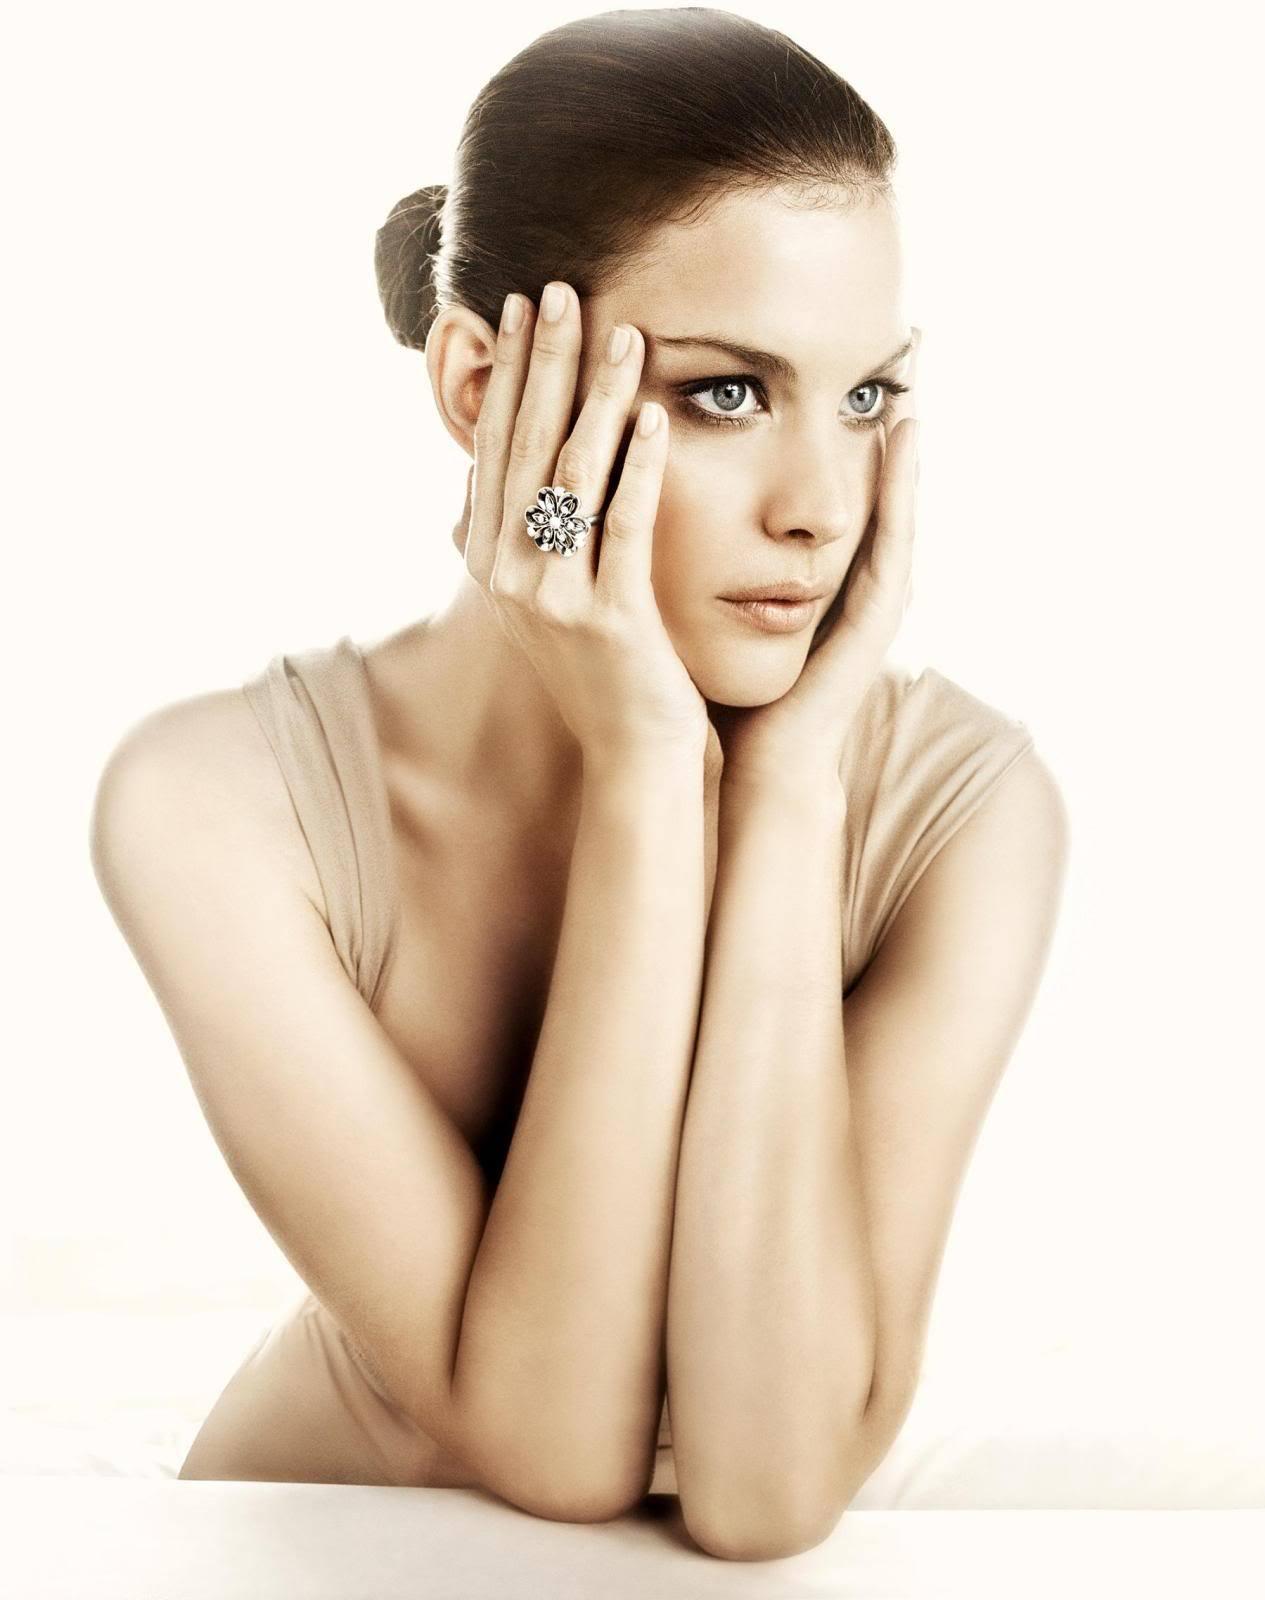 Liv Tyler - Pilgrim Photo Shoot - Sexy Actress Pictures | Hot Actress Pictures - ActressSnaps.com